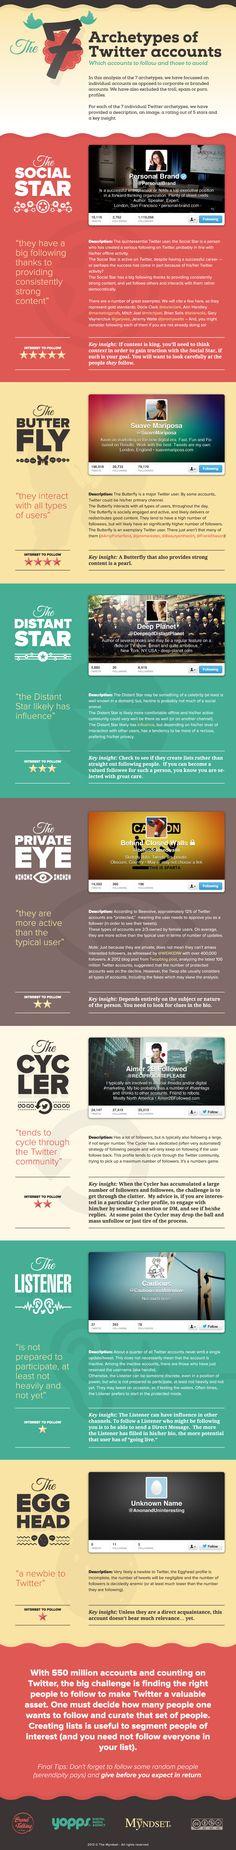 7 arquetipos de usuarios de Twitter #infografia #infographic #socialmedia